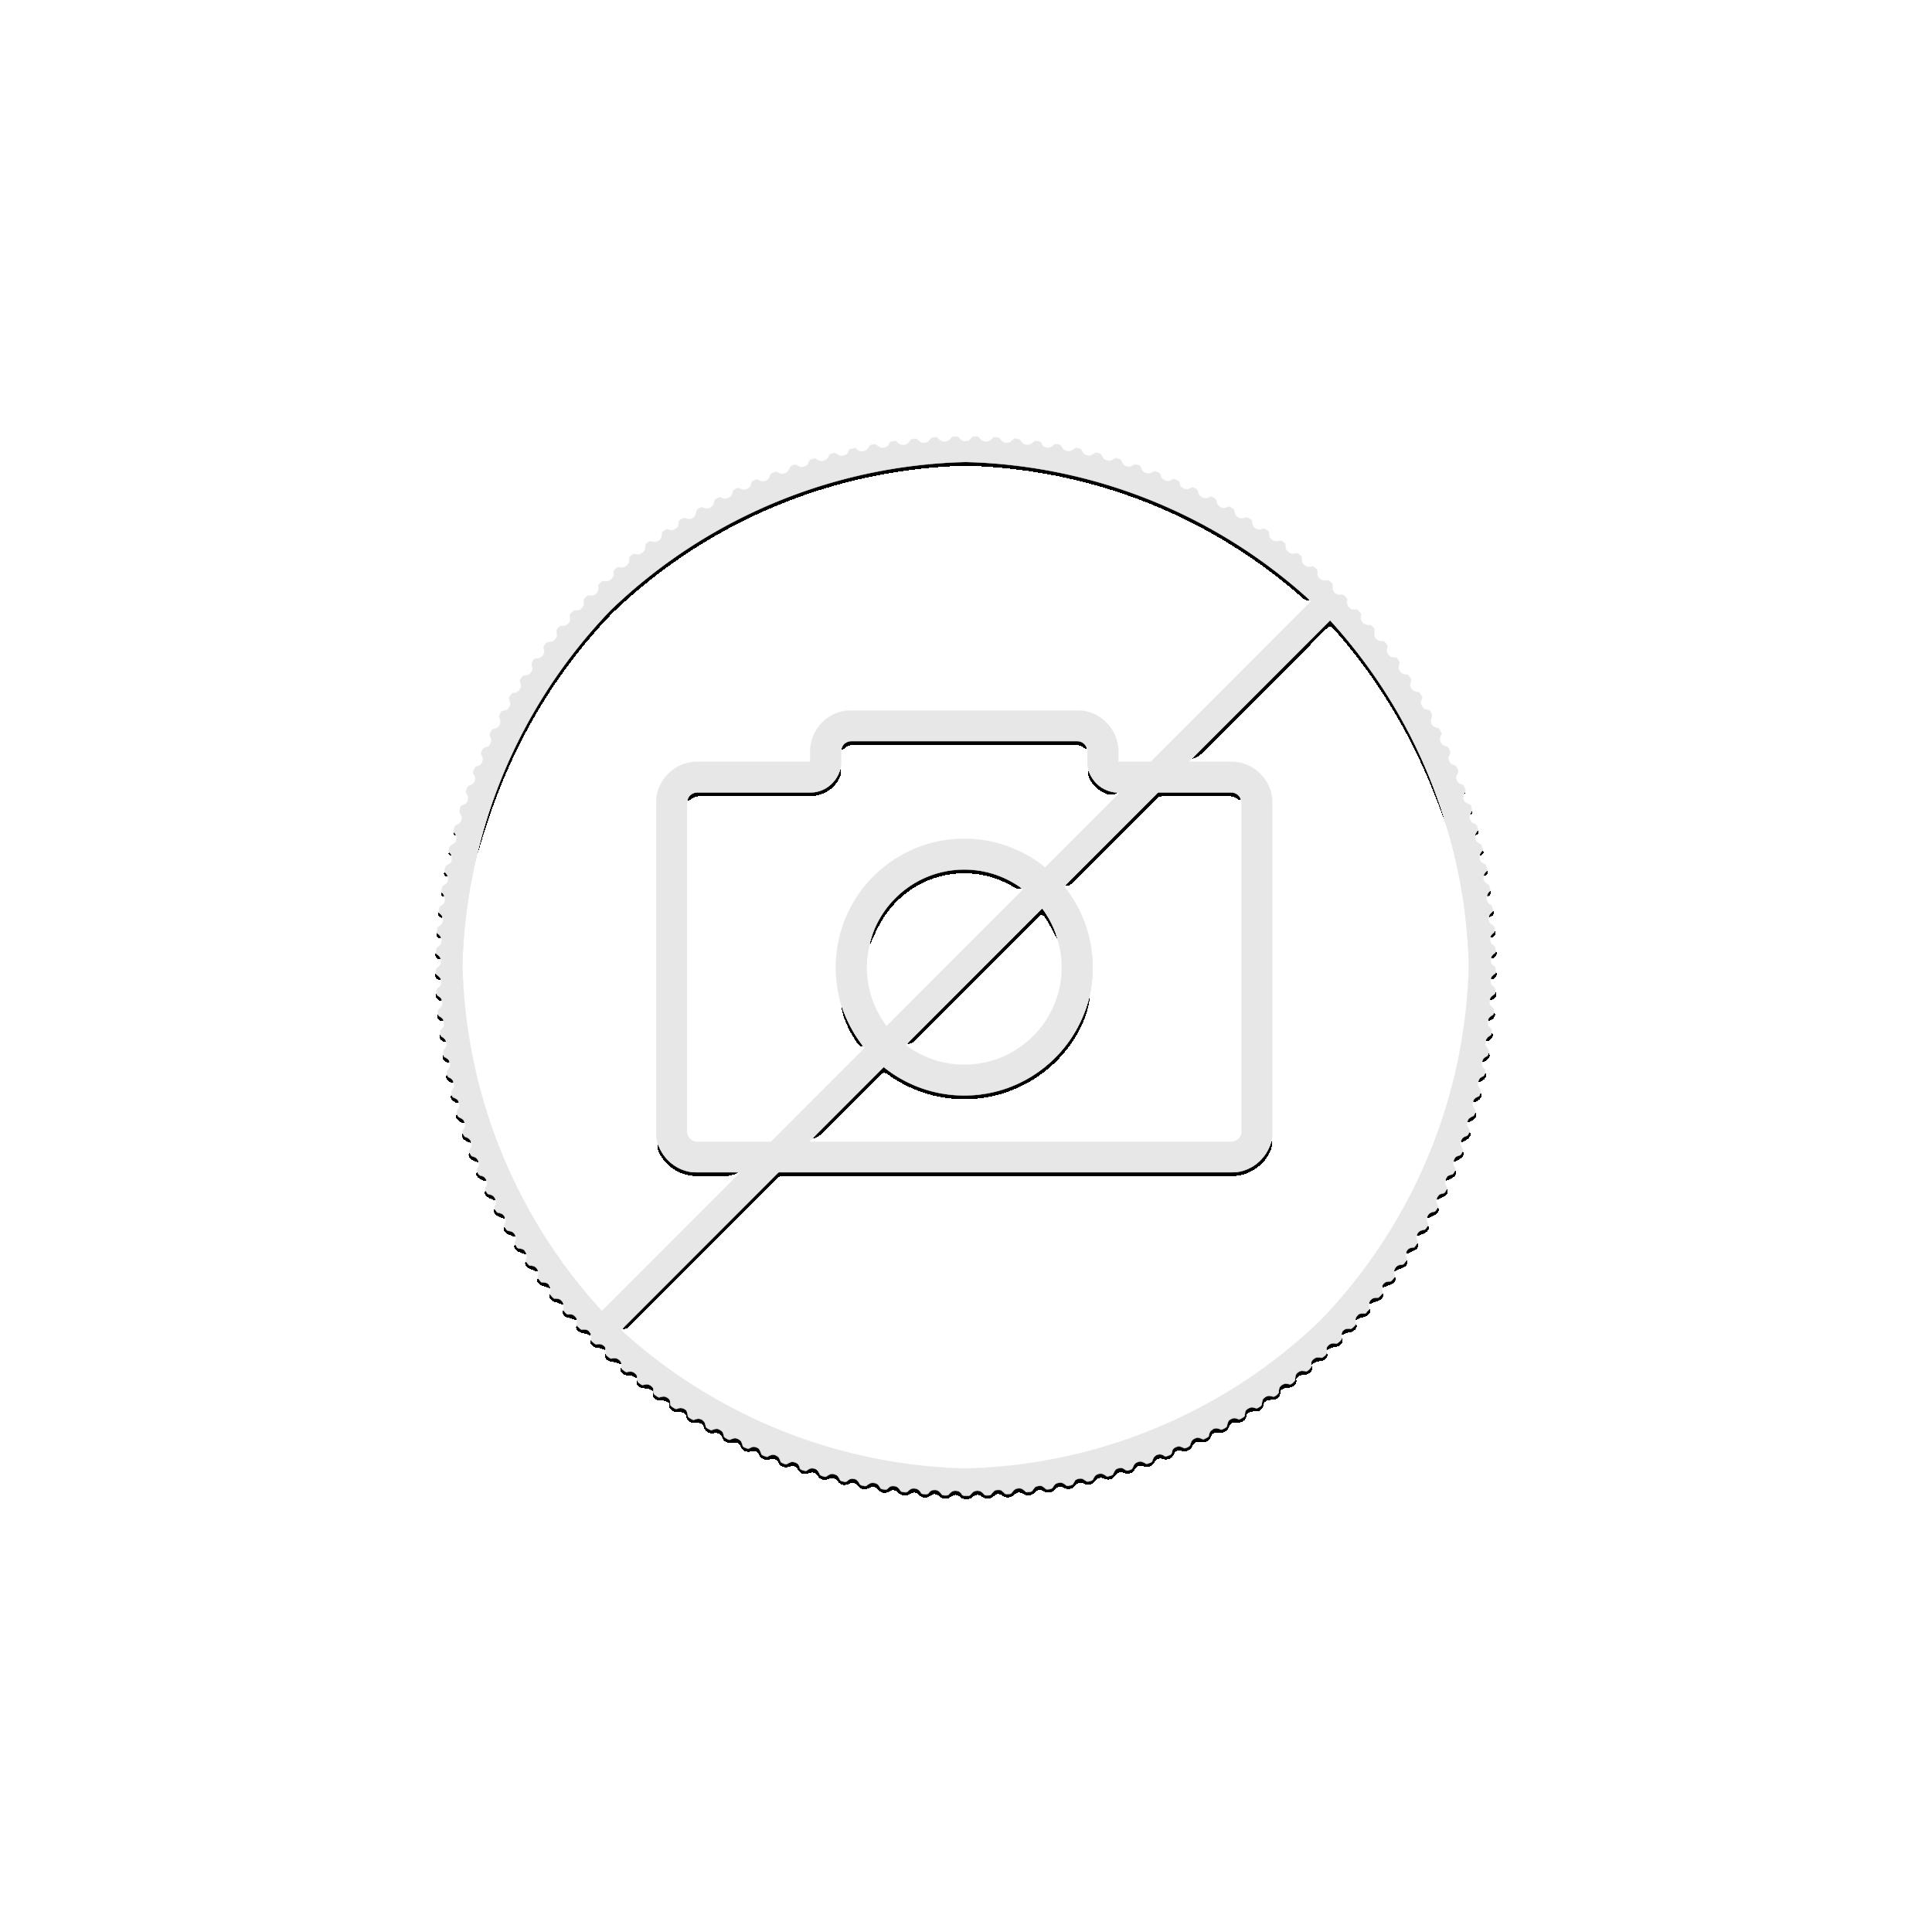 30 Gram gold coin Panda 2021